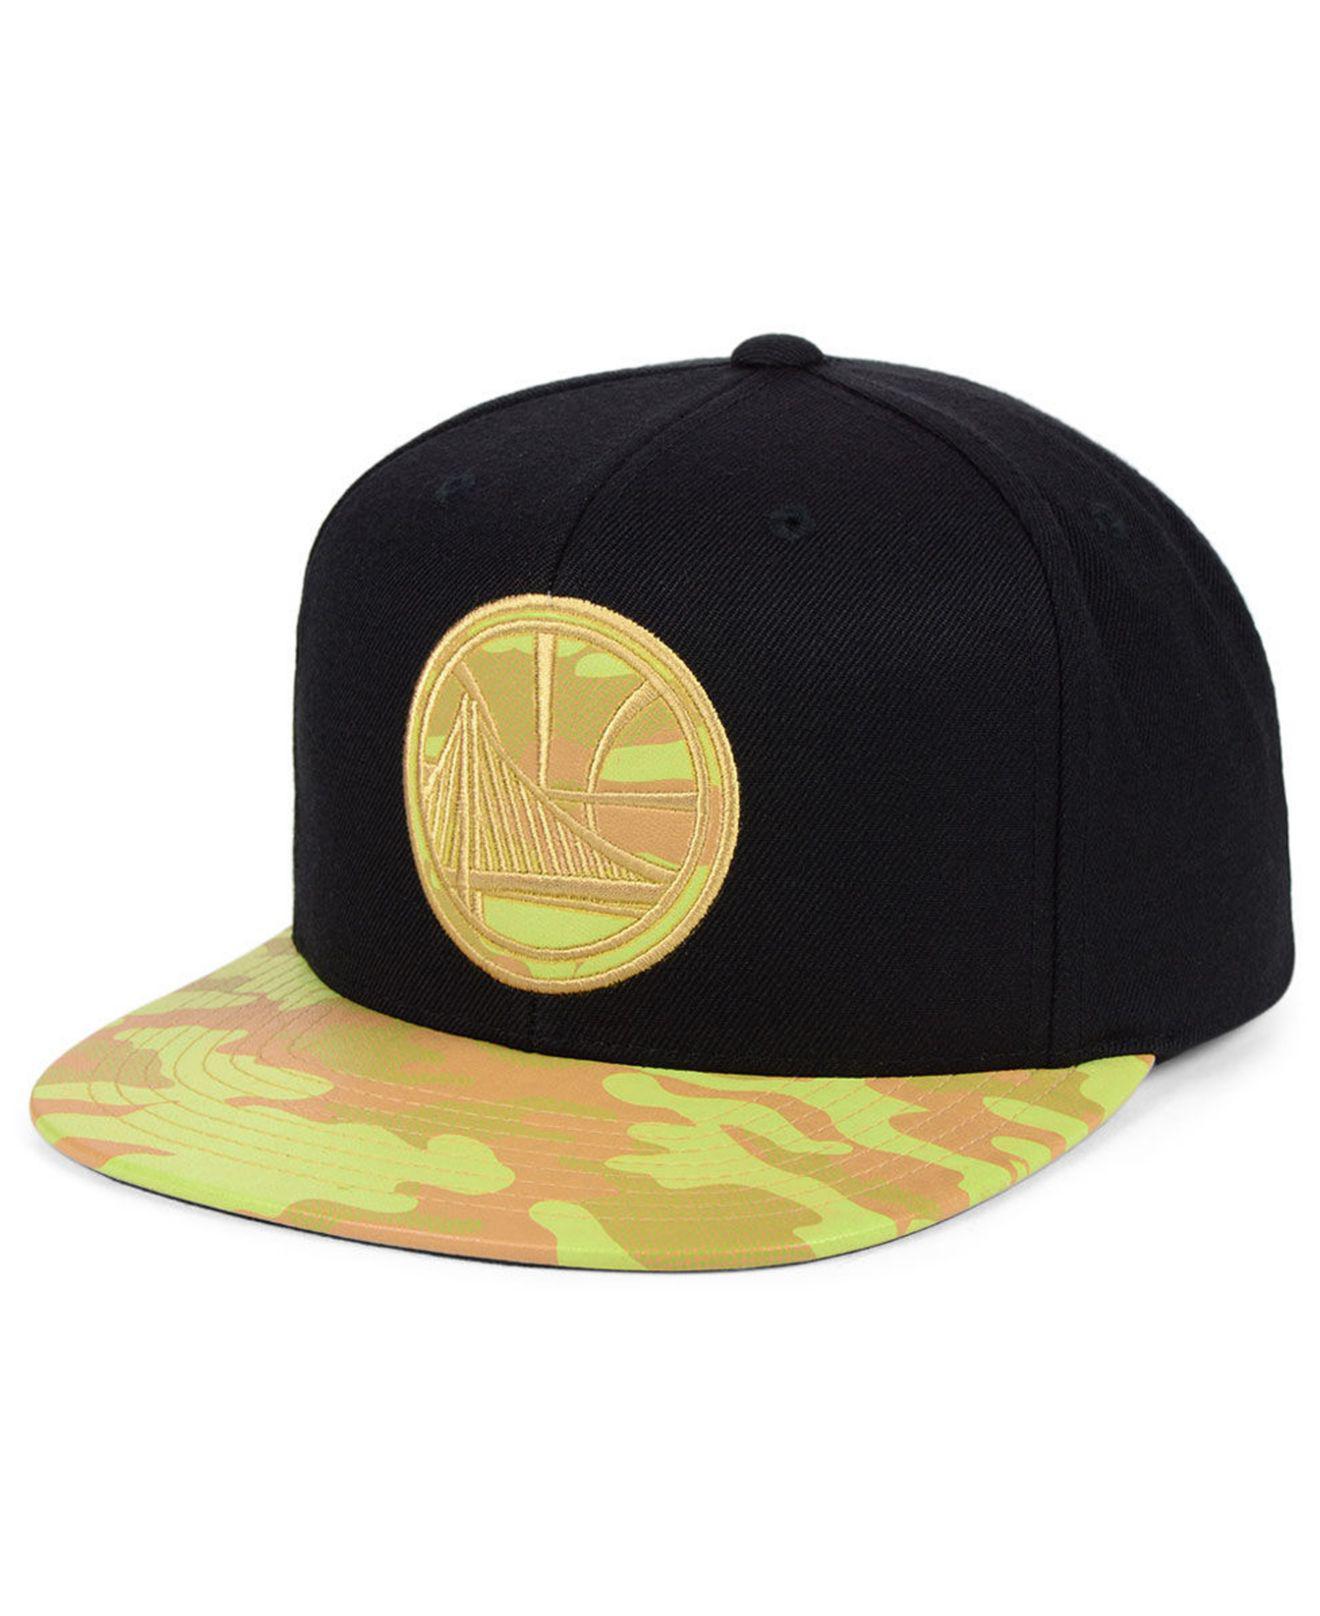 buy online 8a921 623b8 Mitchell   Ness. Men s Black Golden State Warriors Natural Camo Snapback Cap